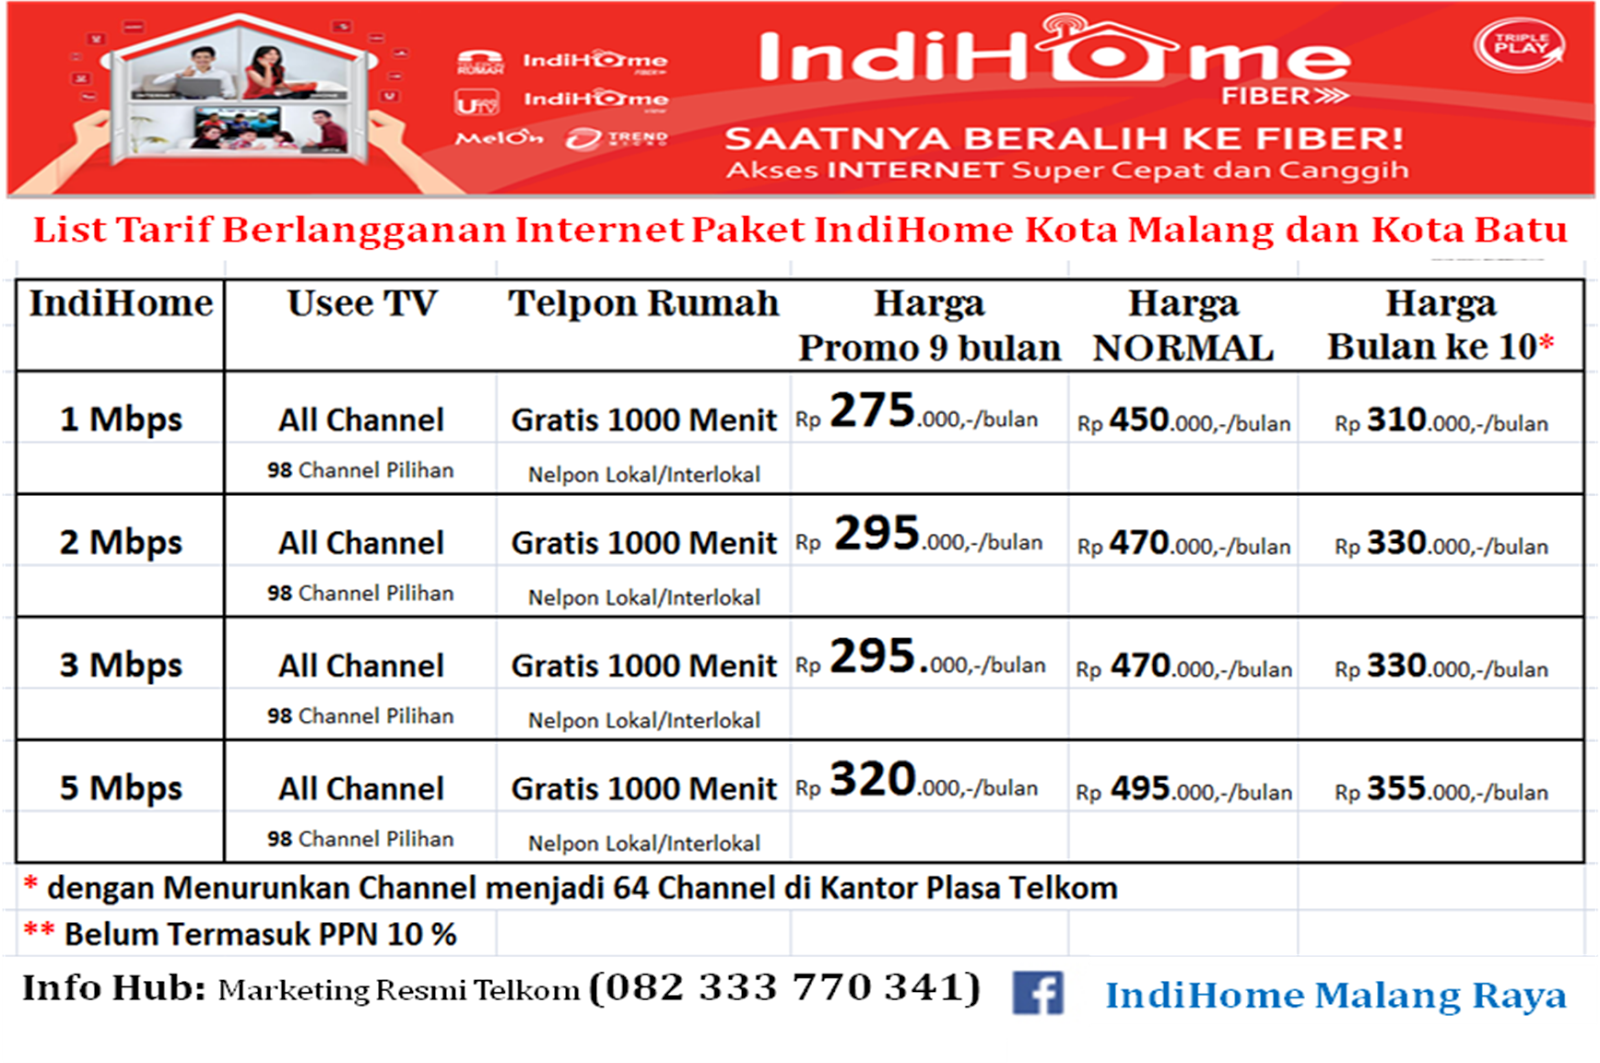 Paket Indihome Internet Super Cepat Maret